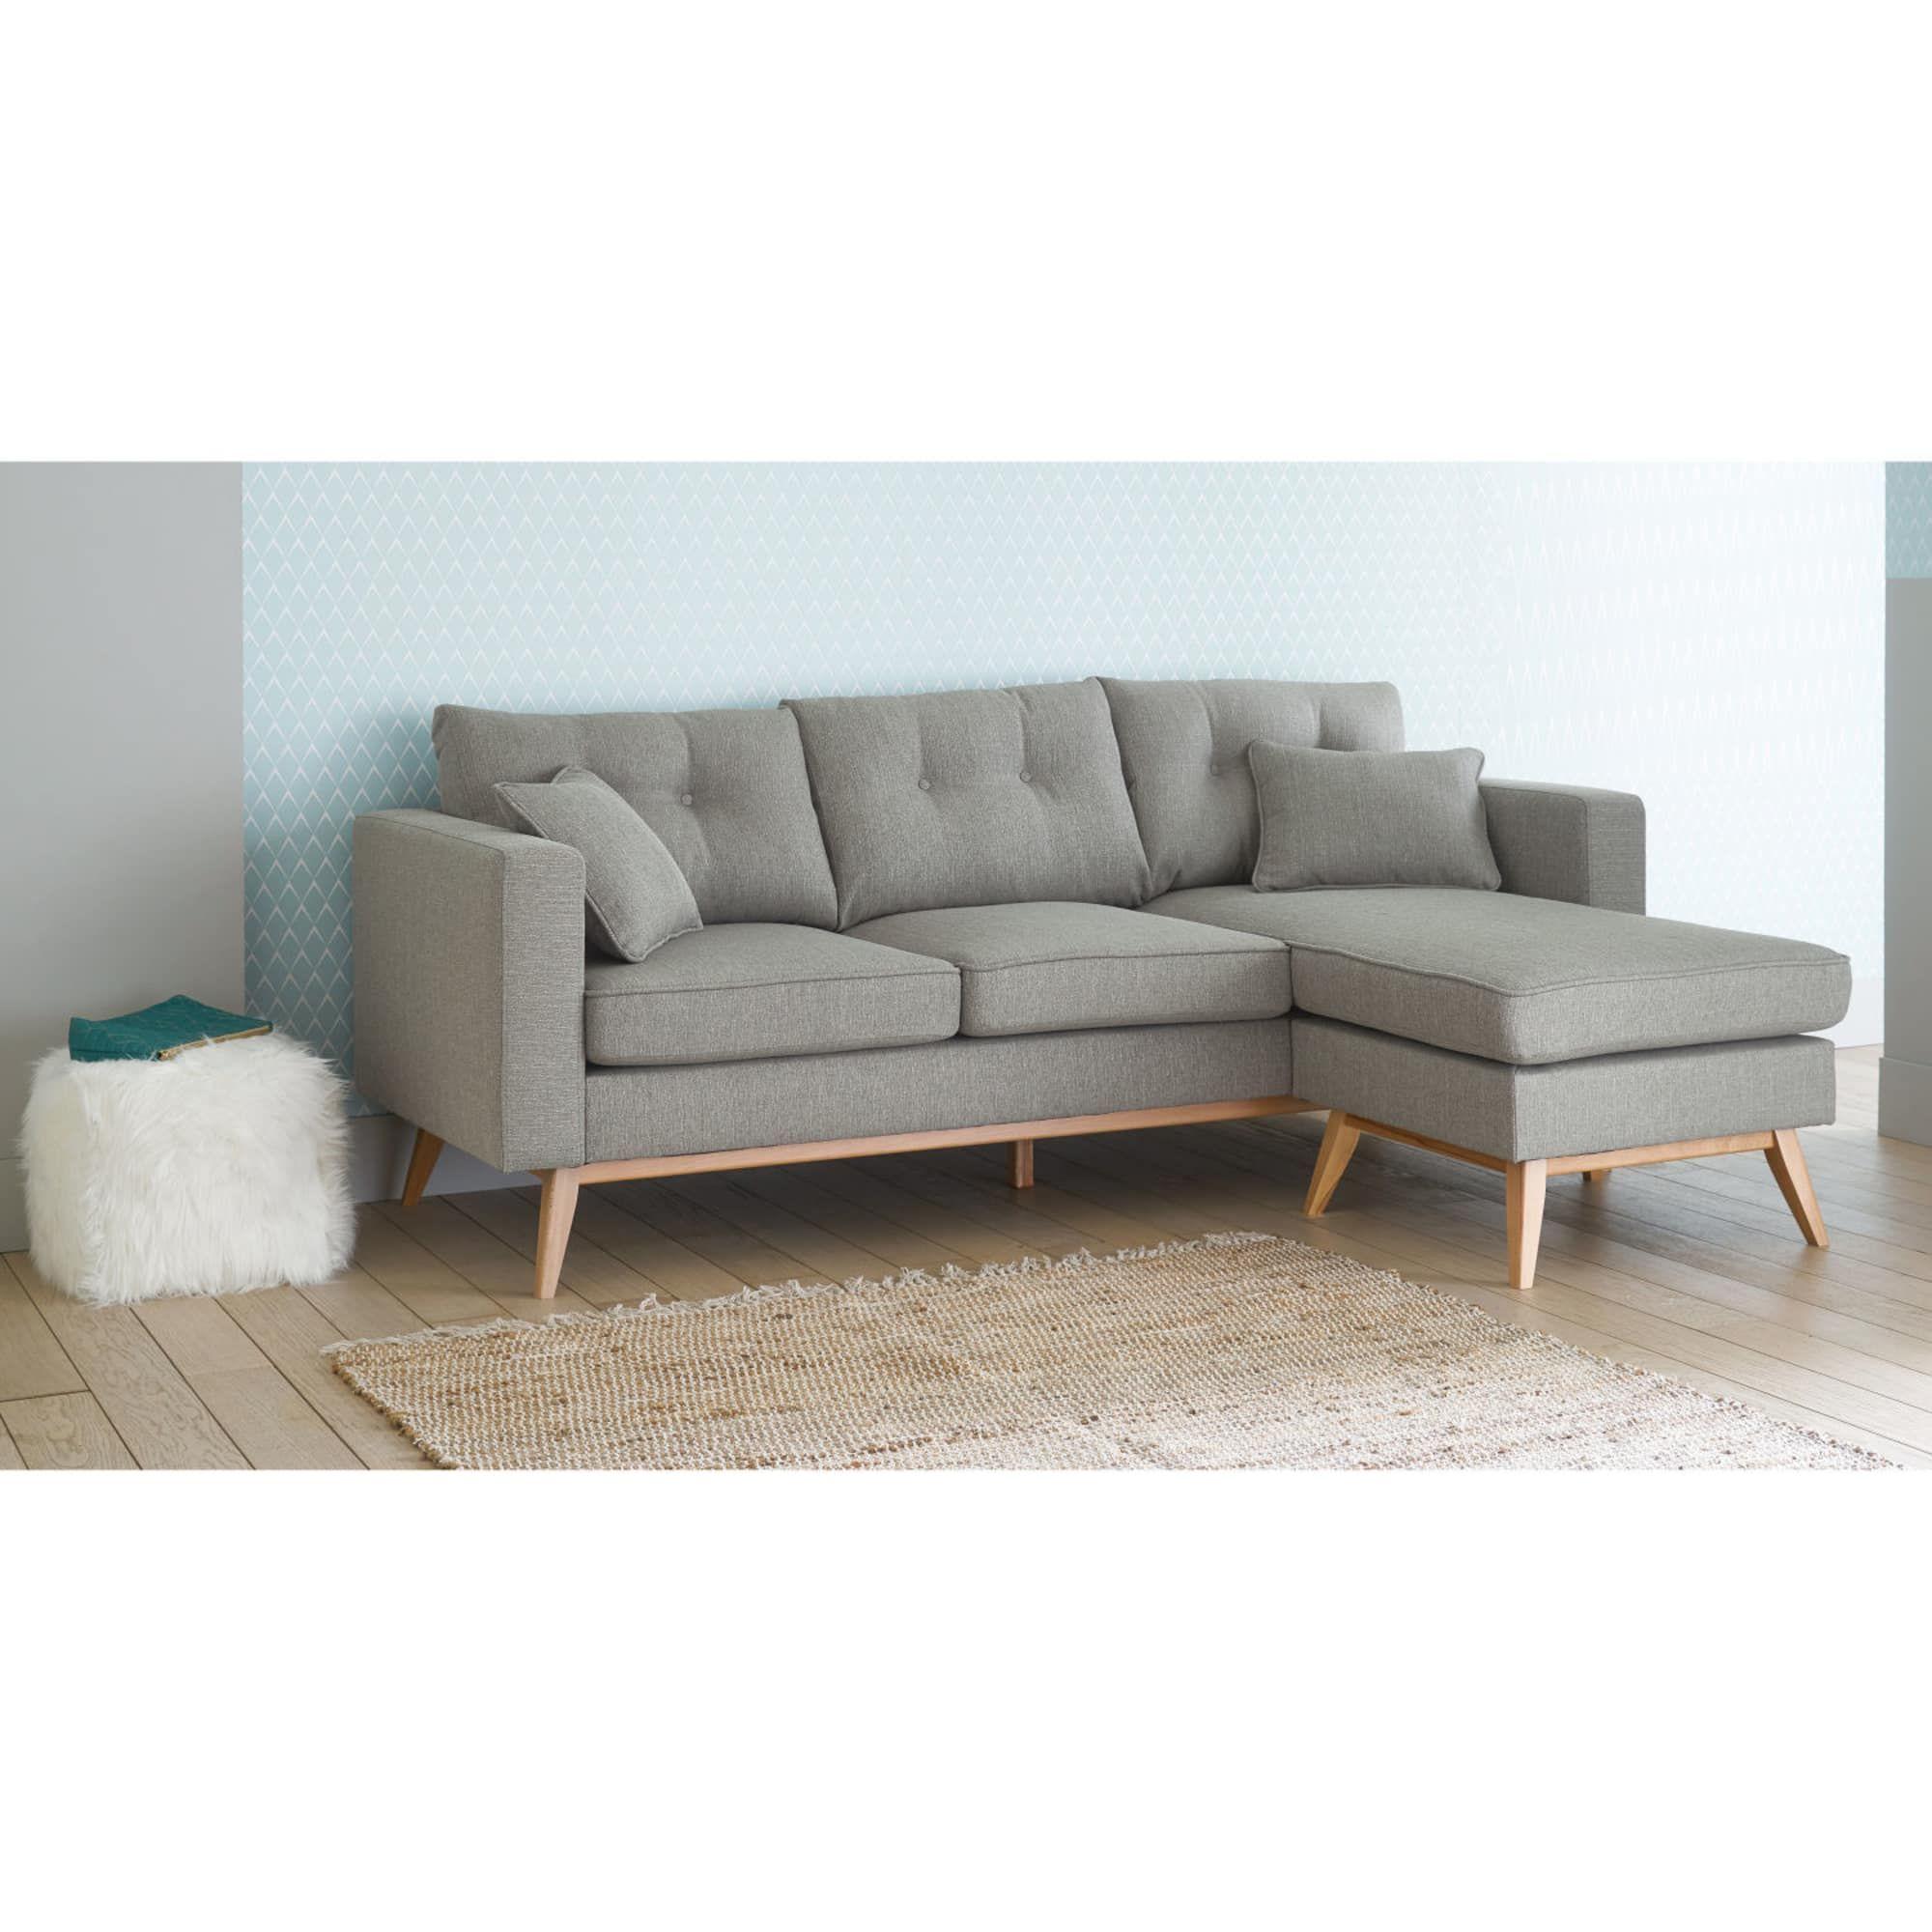 Scandinavian 4/5-Seater Light Grey Modular Corner Sofa in ...